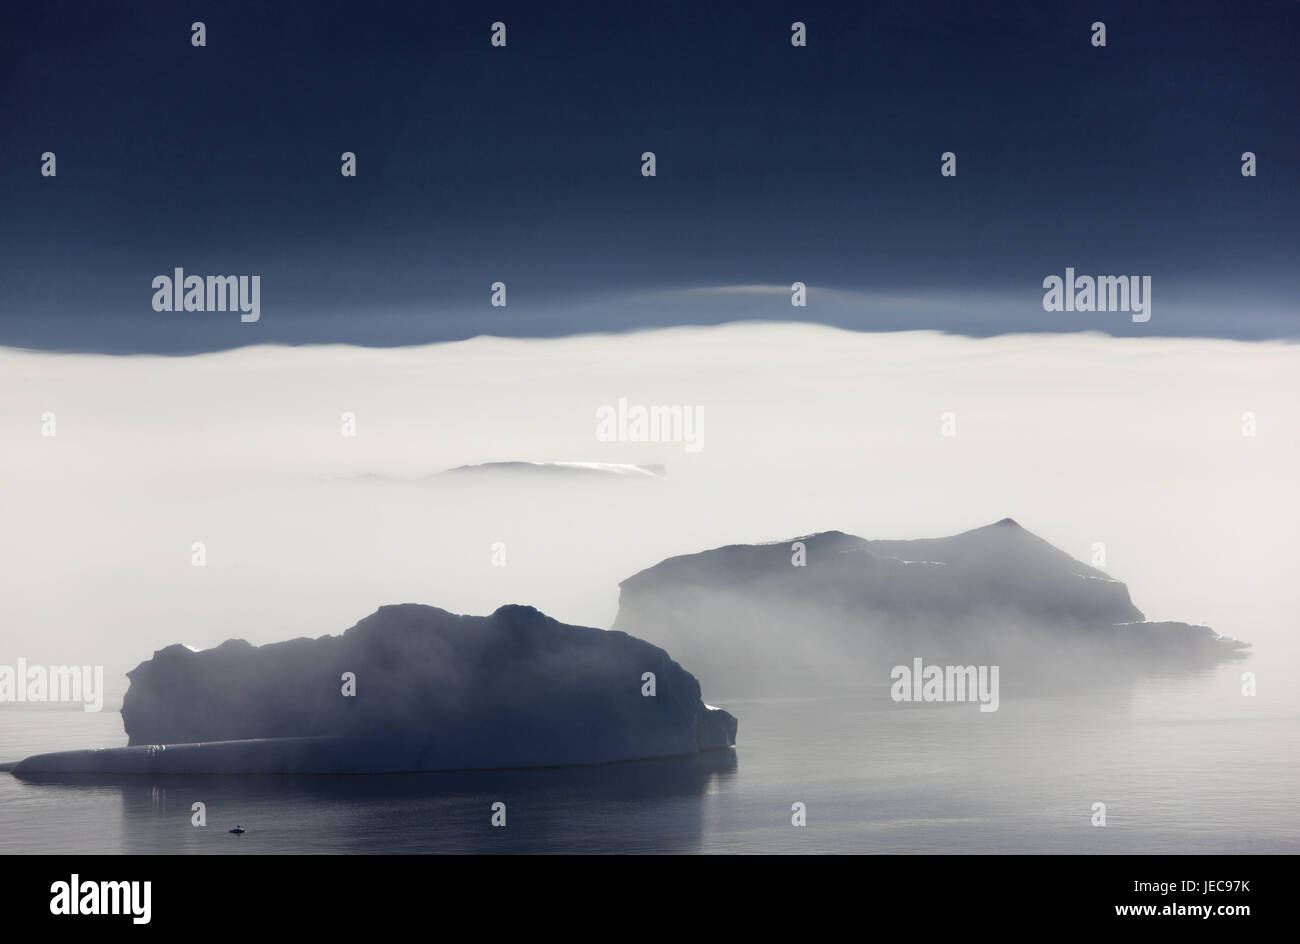 Greenland, Uummannaq, sea, icebergs, fog, Northern Greenland, destination, the Arctic, mountains, E sharp, deserted, - Stock Image